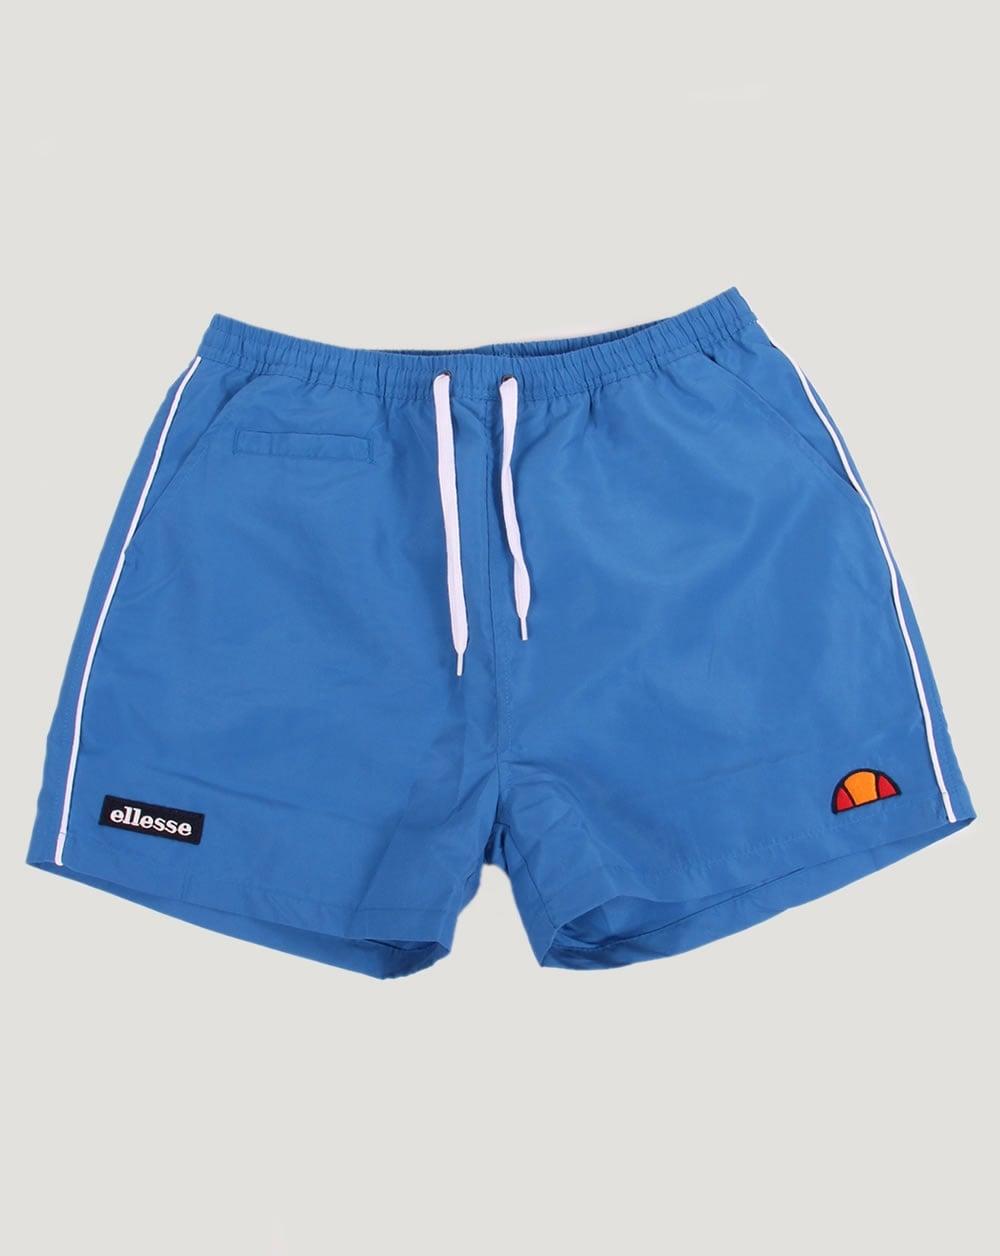 Royal Blue Ellesse Verdo Swim Shorts BNWT